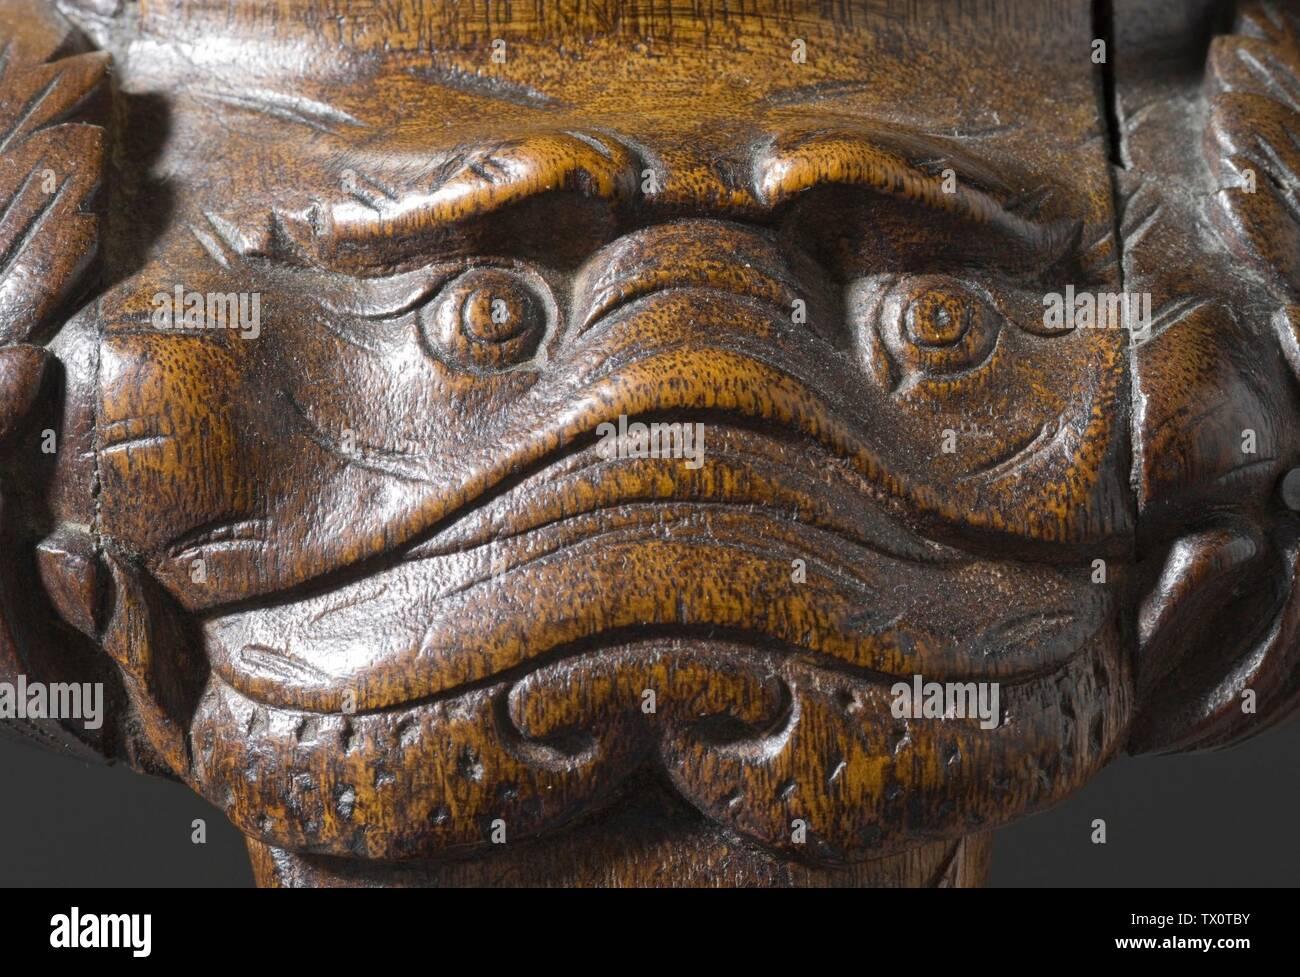 'Tarjeta de mesa con Mask-Carved rodillas (Imagen 4 de 4); en inglés: Estados Unidos, Massachusetts, Boston, circa 1750; muebles muebles de nogal, pinares con forro de tapete verde original 28 1/4 x 37 1/8 x 25 1/2 pulg. (71,76 x 94,30 x 64,77 cm) de regalo de la Sra. Murray Braunfeld (M.2006.51.2) Artes Decorativas y diseño; circa 1750 fecha QS:P571,+1750-00-00T00:00:00Z/9,P1480,Q5727902; ' Imagen De Stock